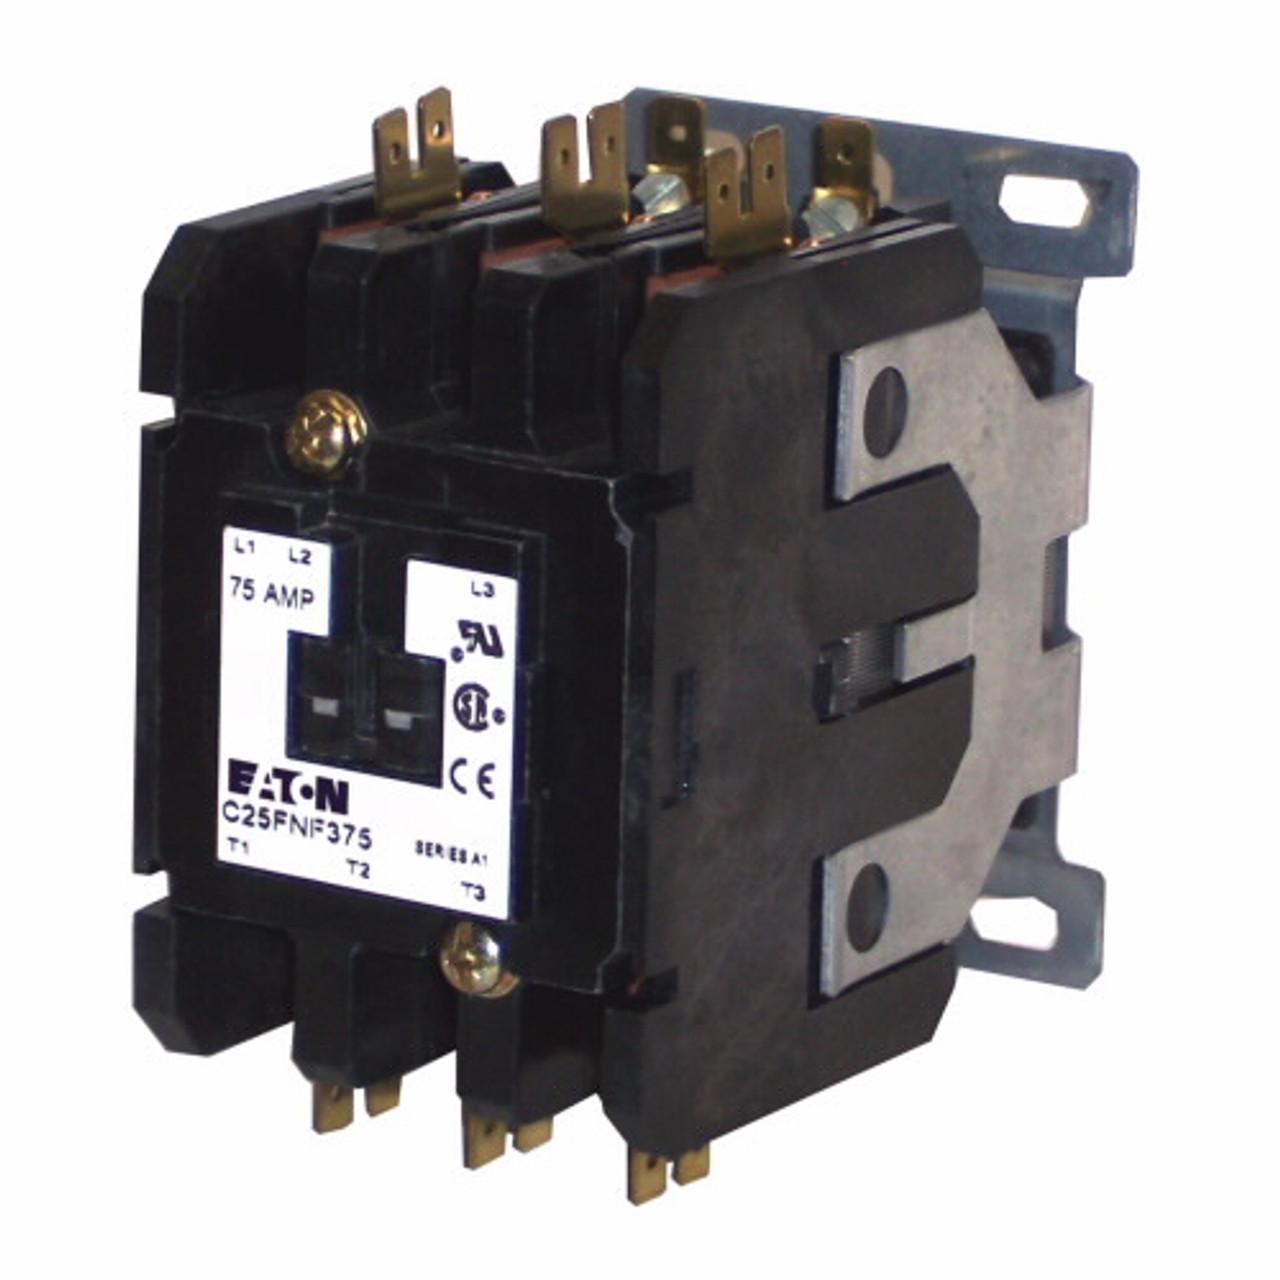 C25GNF290A Contactor